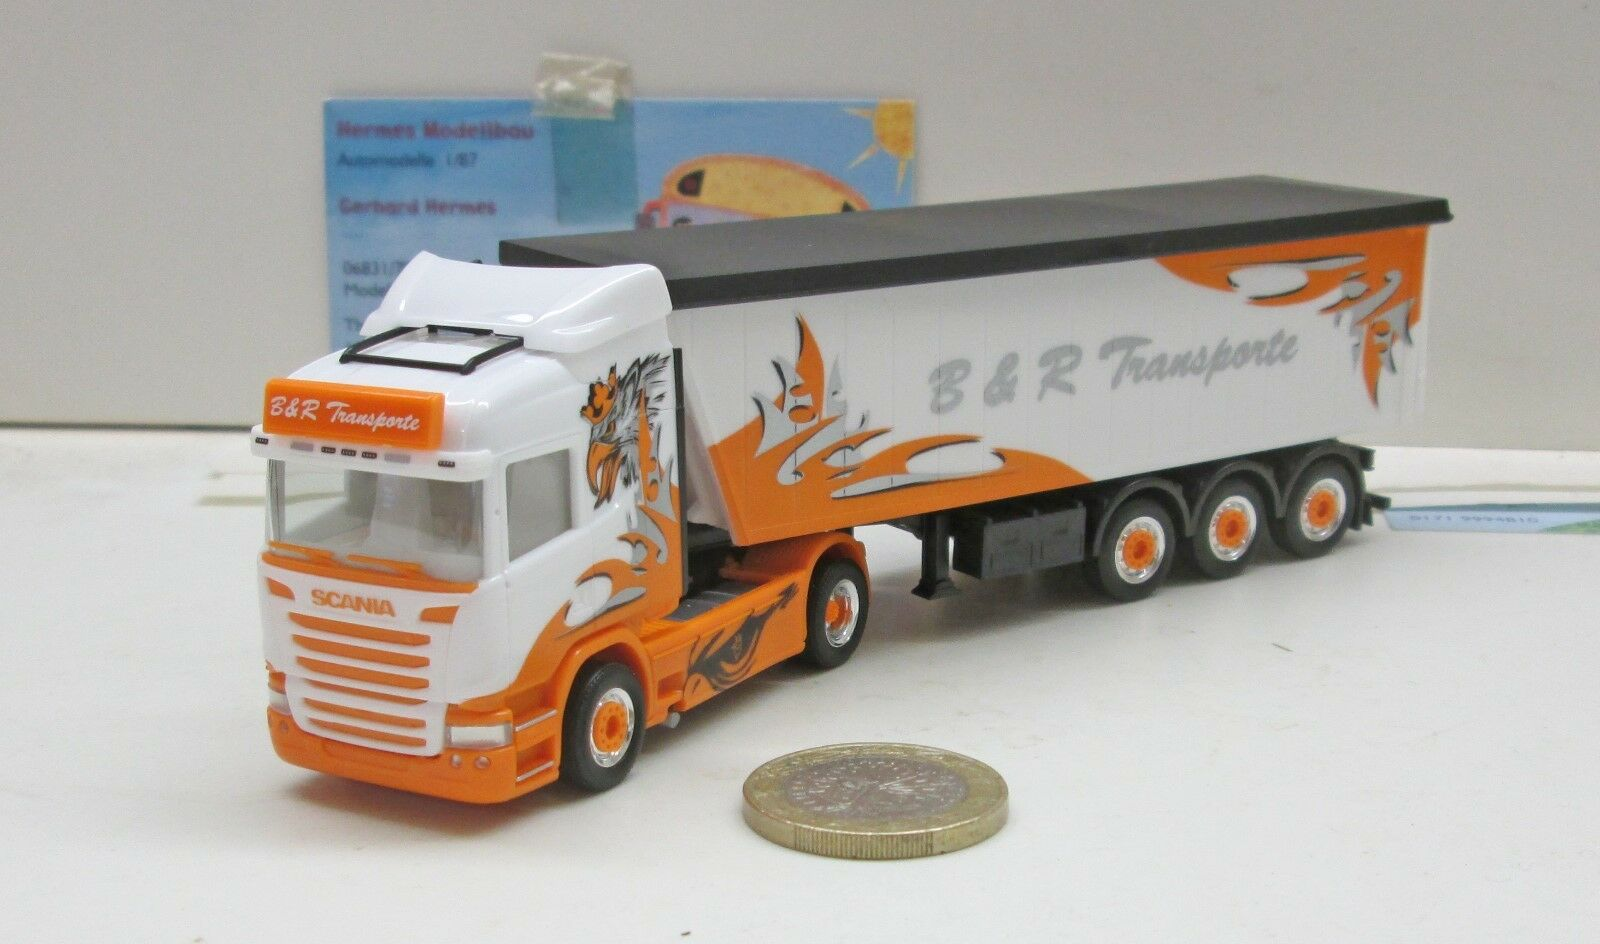 Herpa 306287 scania R hl stöffelliner-remolcarse  b&r transportes Arrow hunter